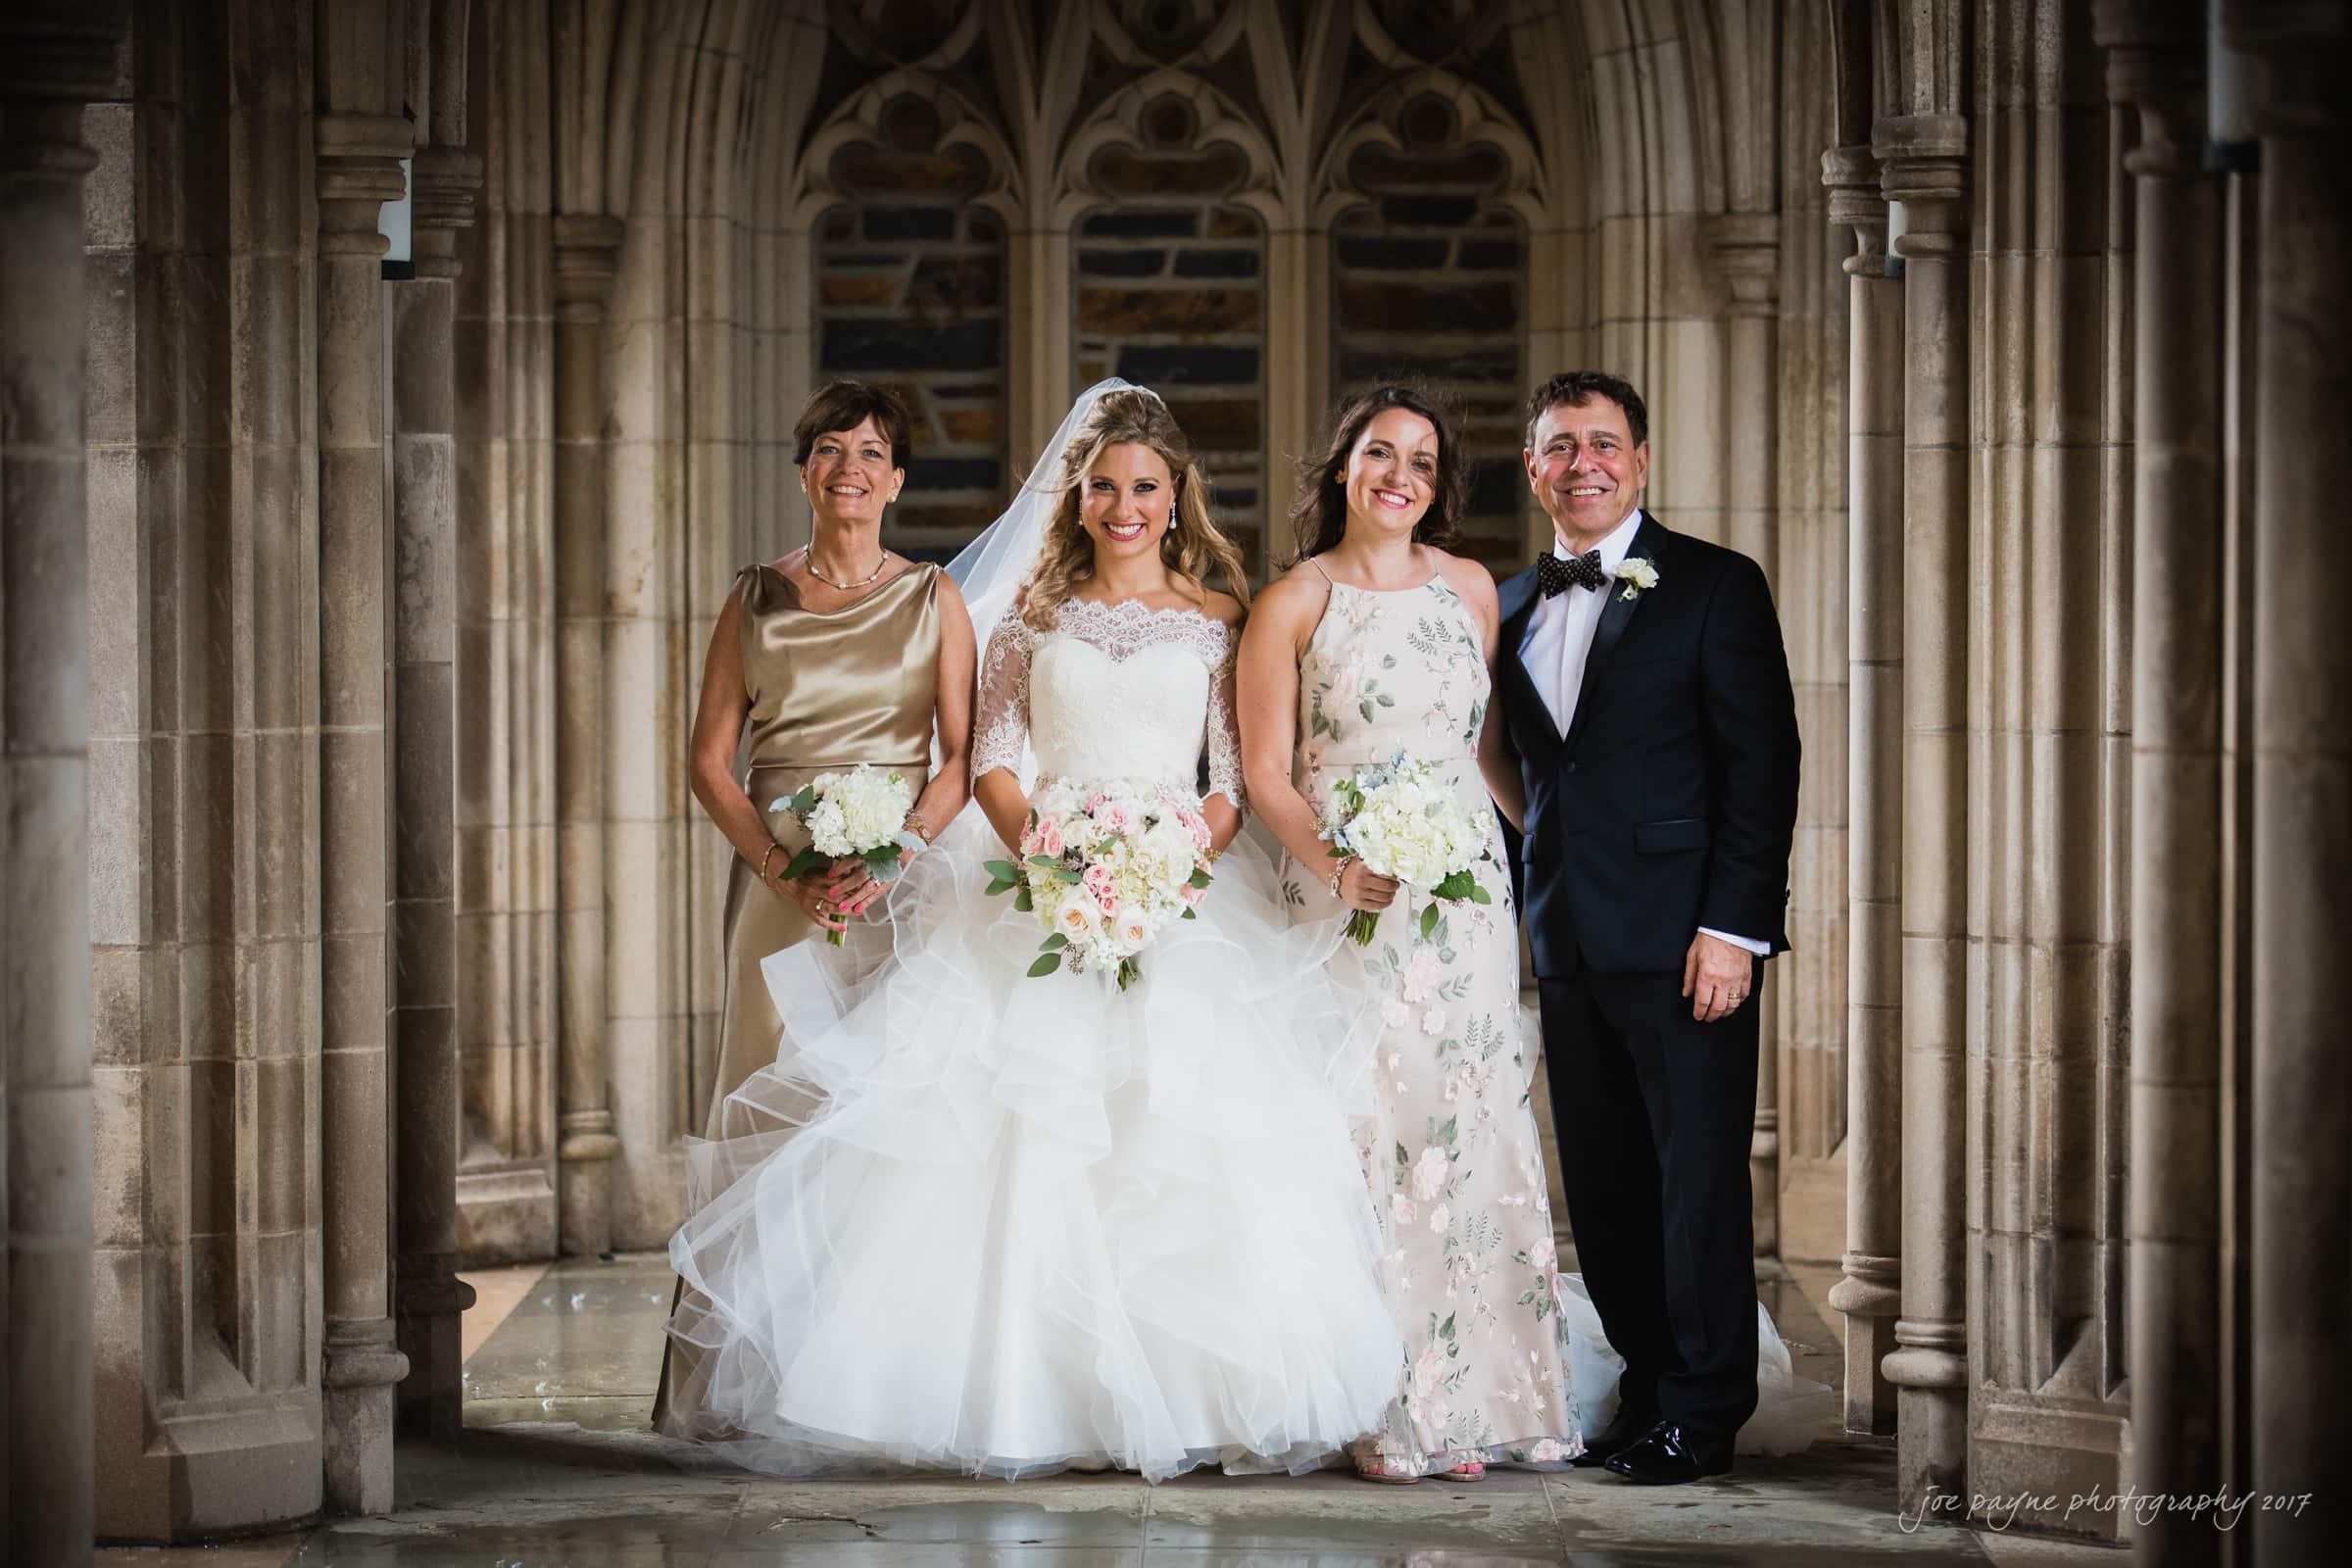 duke chapel wedding photos - bride and family in arcades